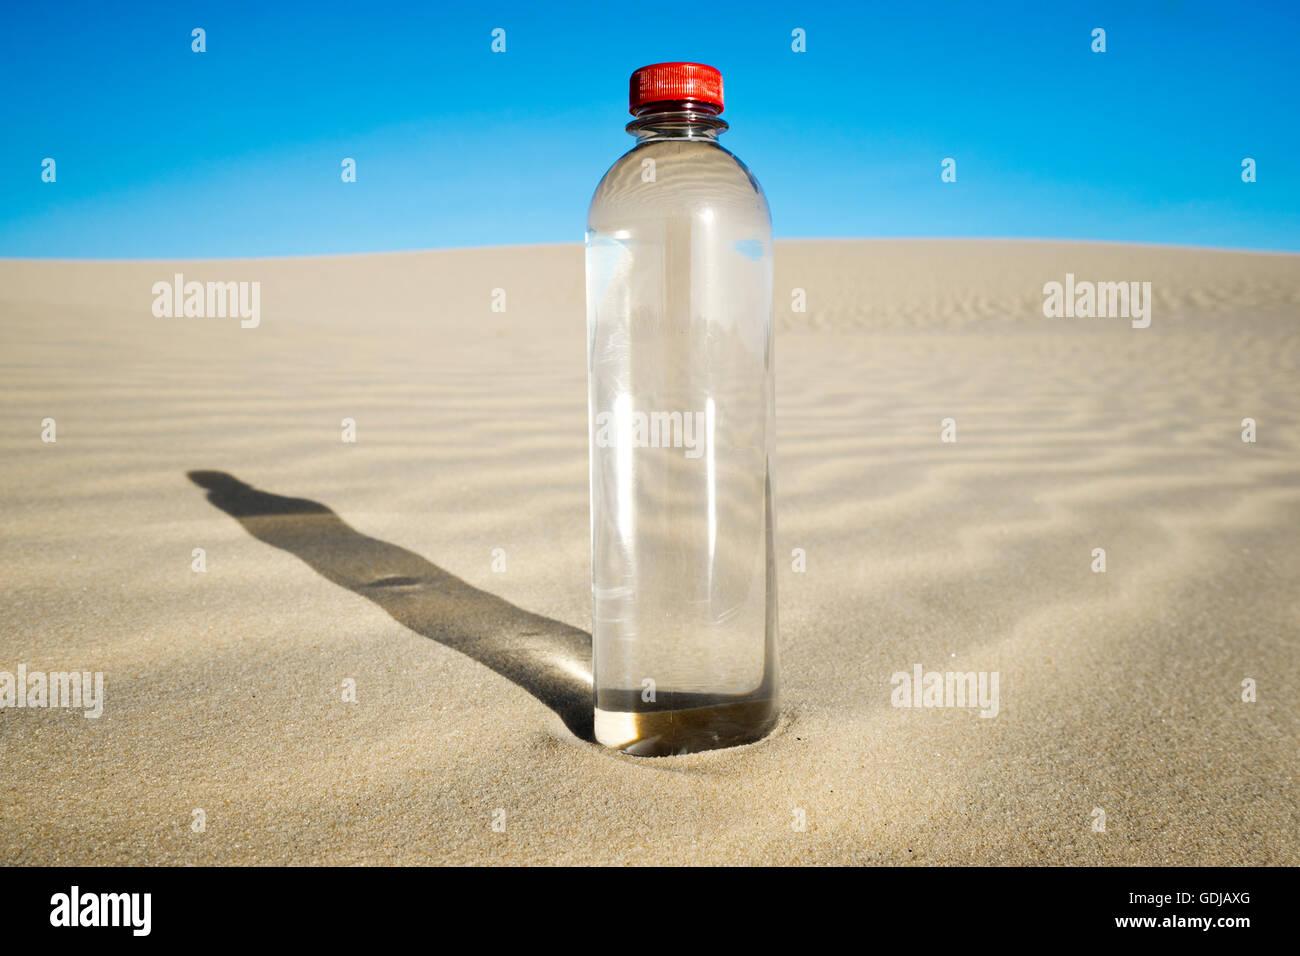 PET water bottle in desert landscape - Stock Image